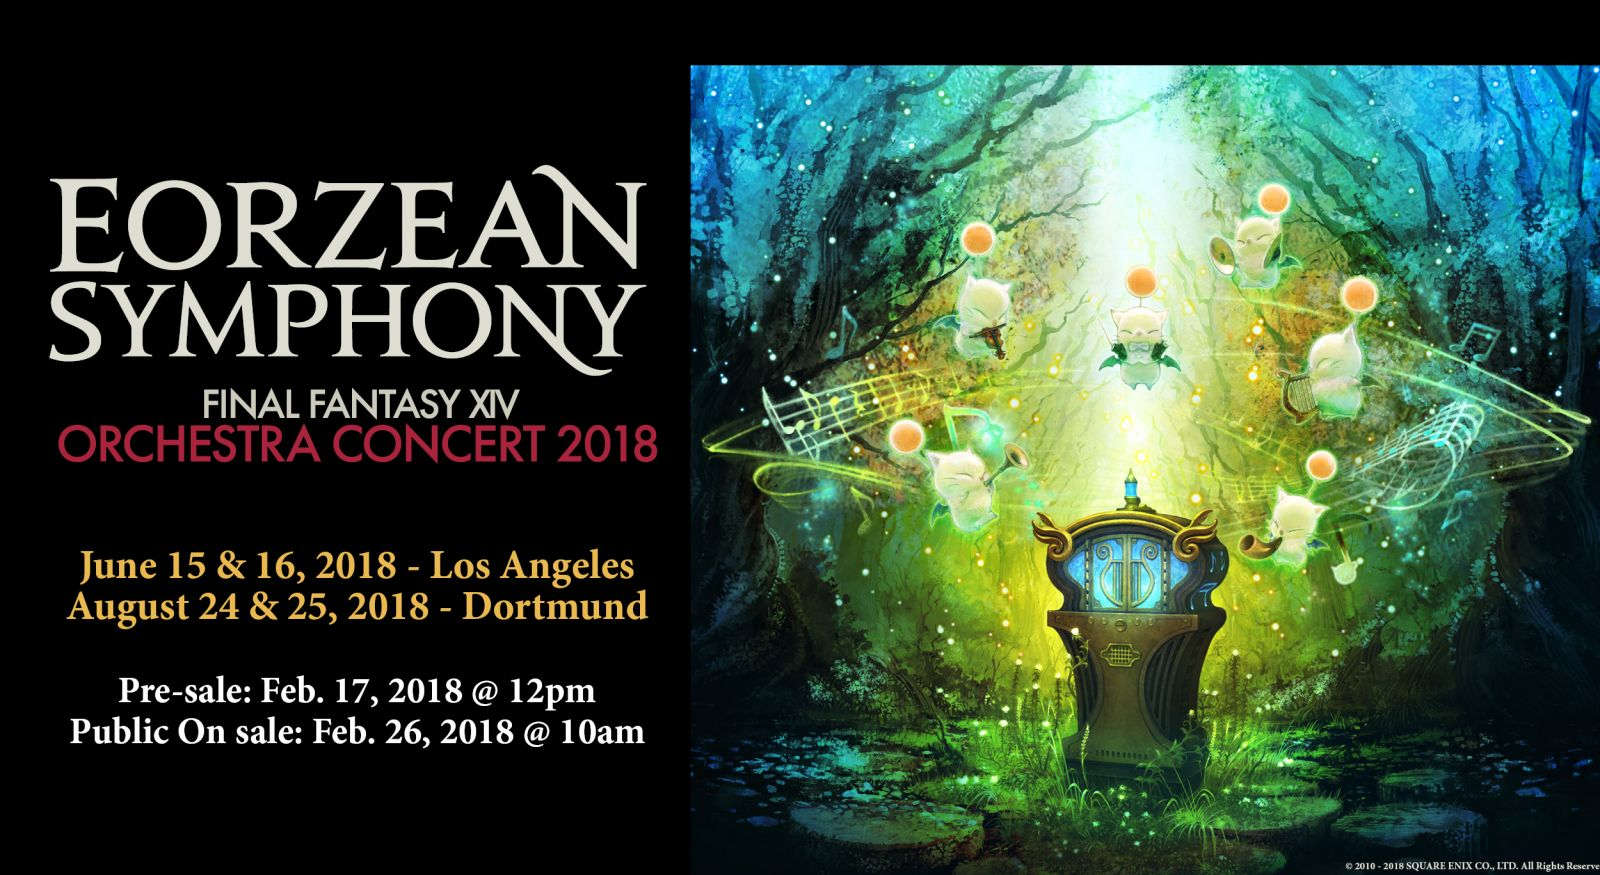 Final Fantasy XIV Revealed The Trailer Of Eorzean Symphony